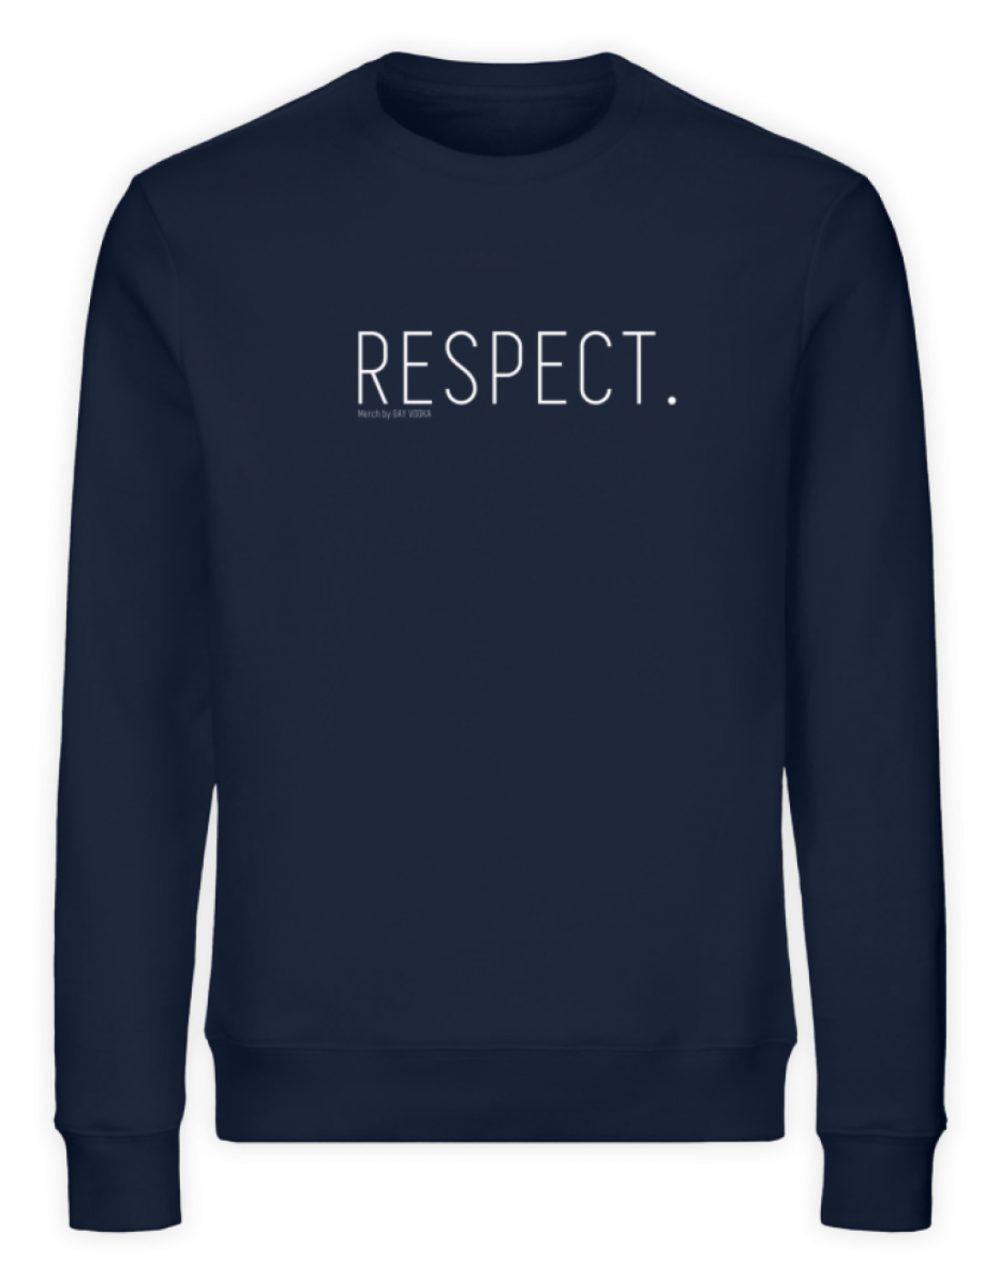 RESPECT. - Unisex Organic Sweatshirt-6887